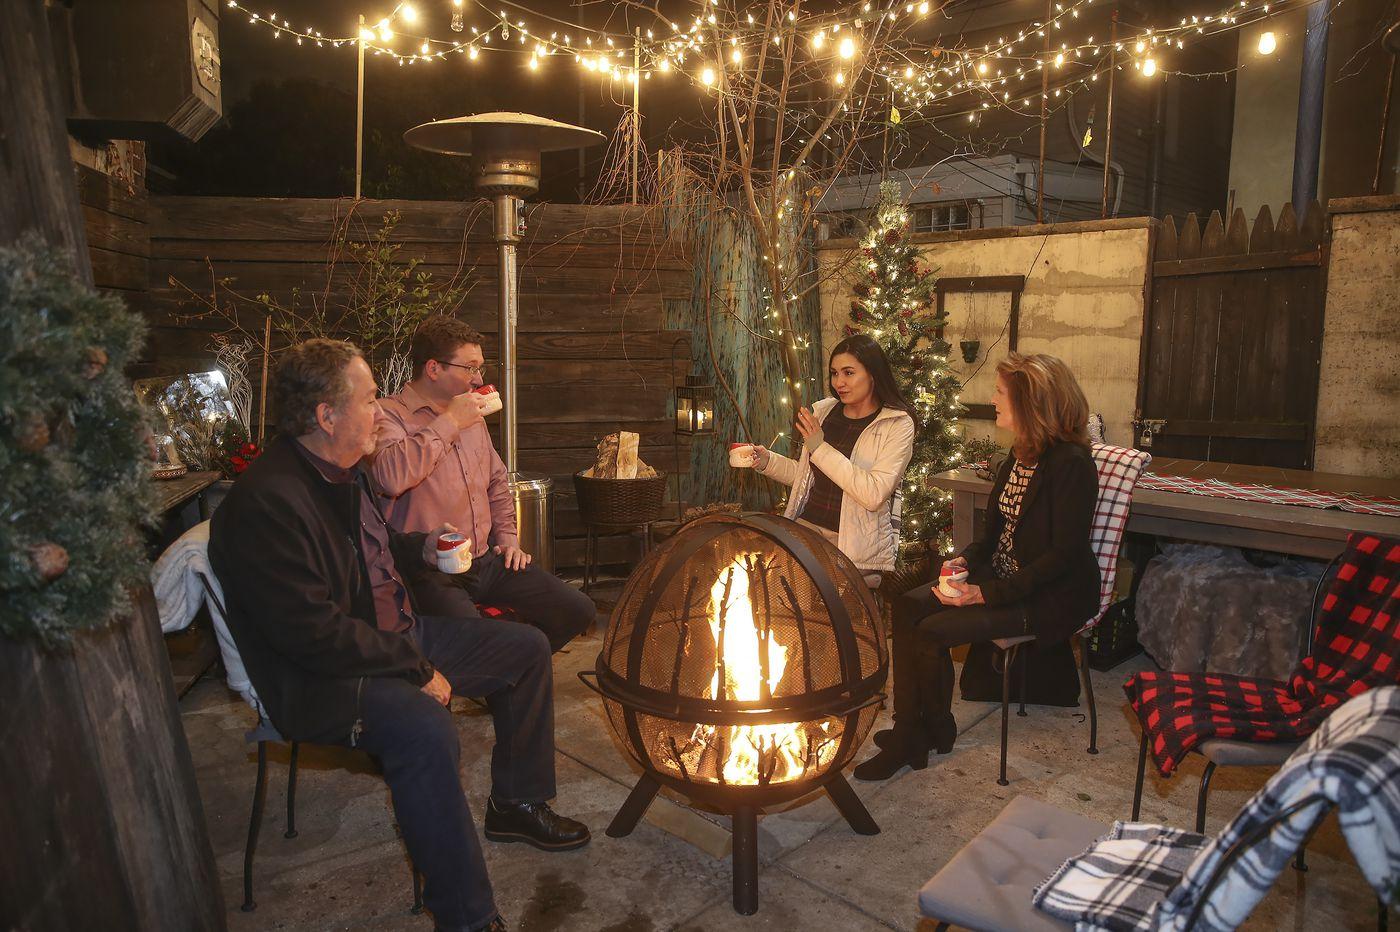 Restaurants hope people keep eating outside as the weather cools   Coronavirus Newsletter